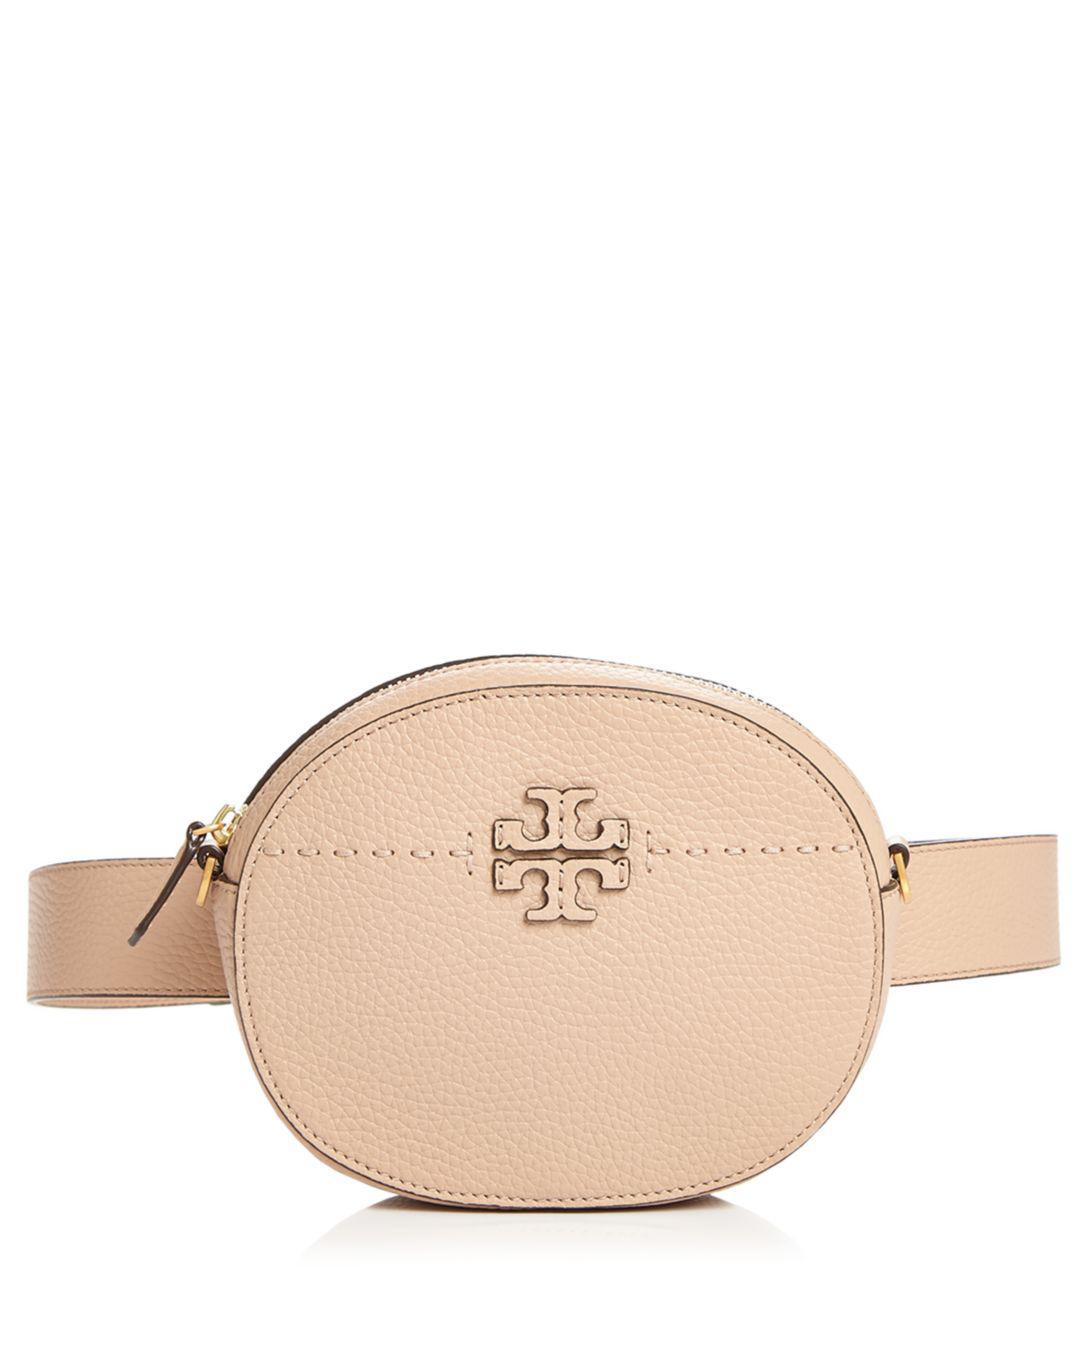 b648a87e5c72 Tory Burch. Women s Mcgraw Round Leather Convertible Crossbody